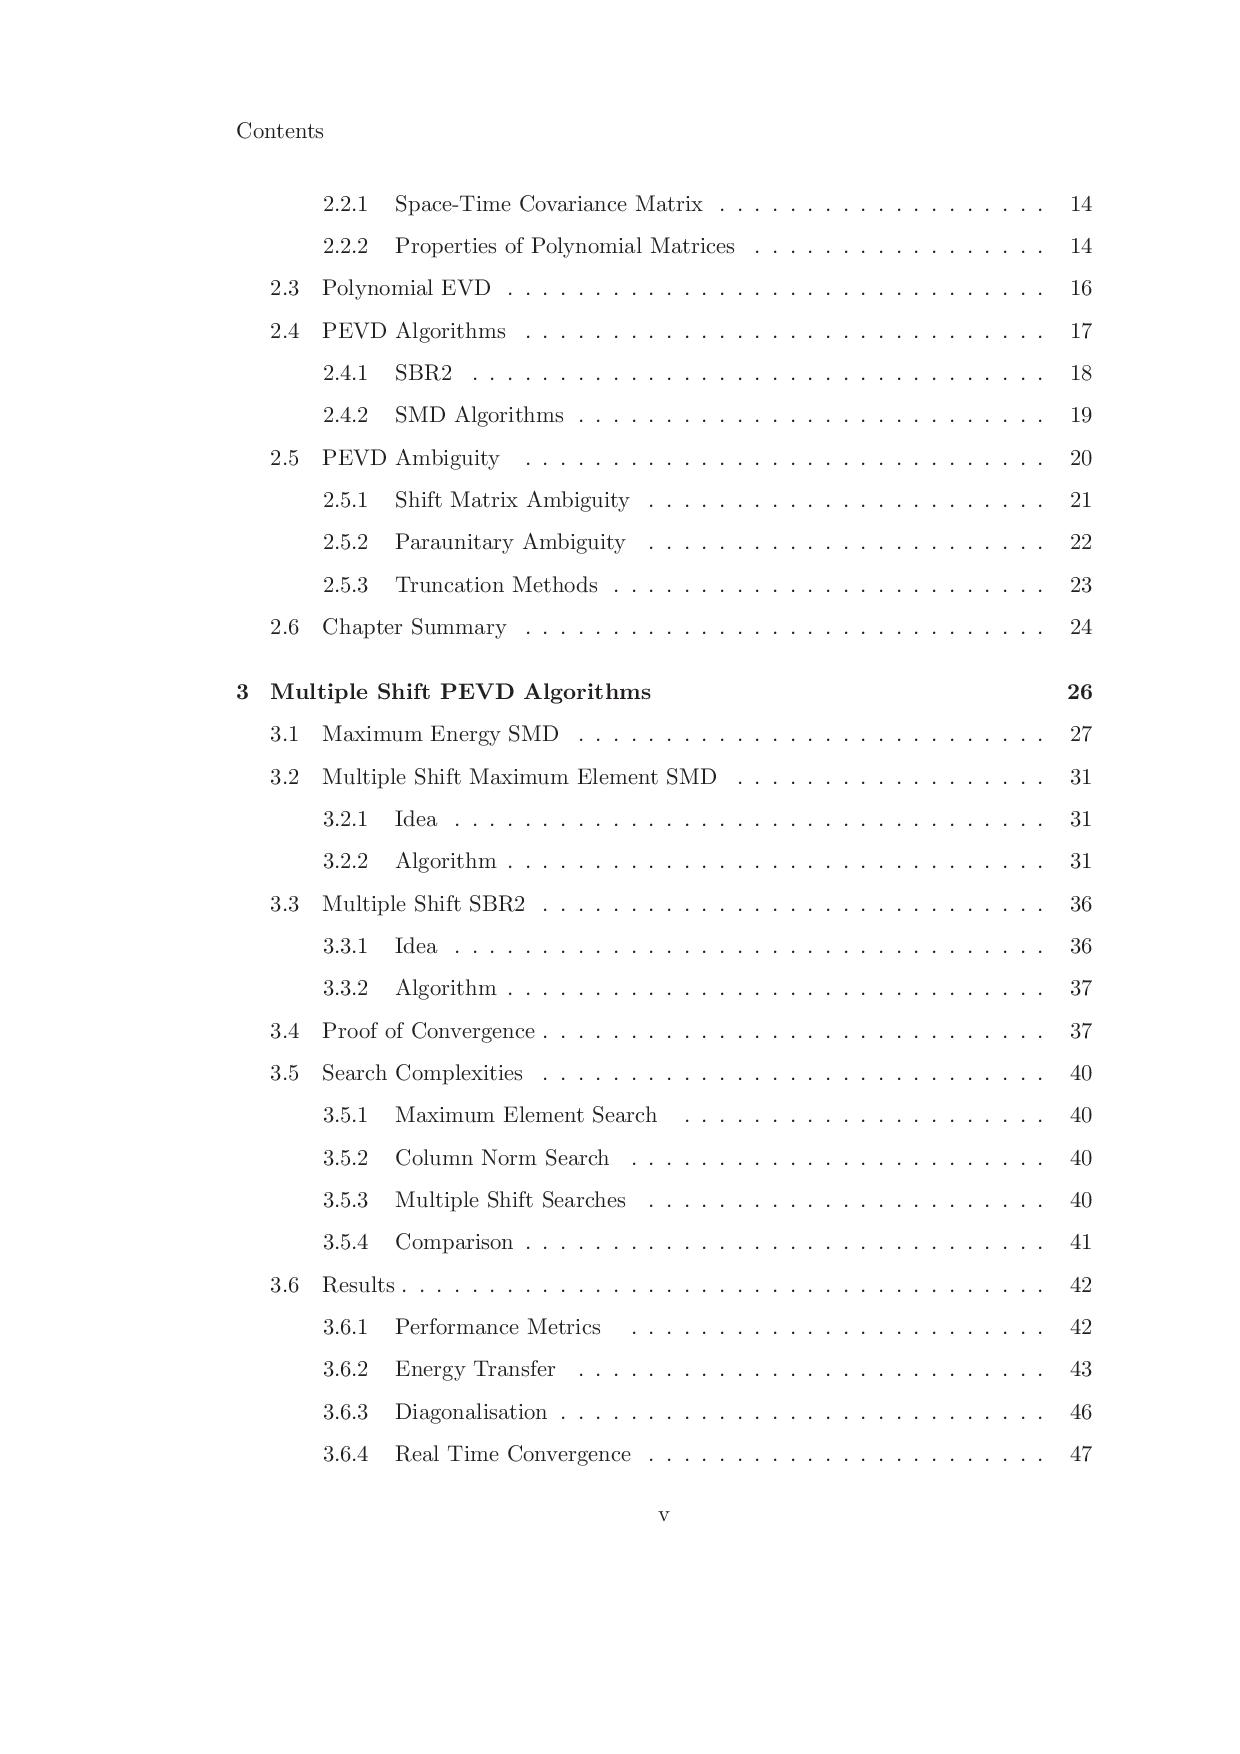 Advanced Algorithms for Polynomial Matrix Eigenvalue